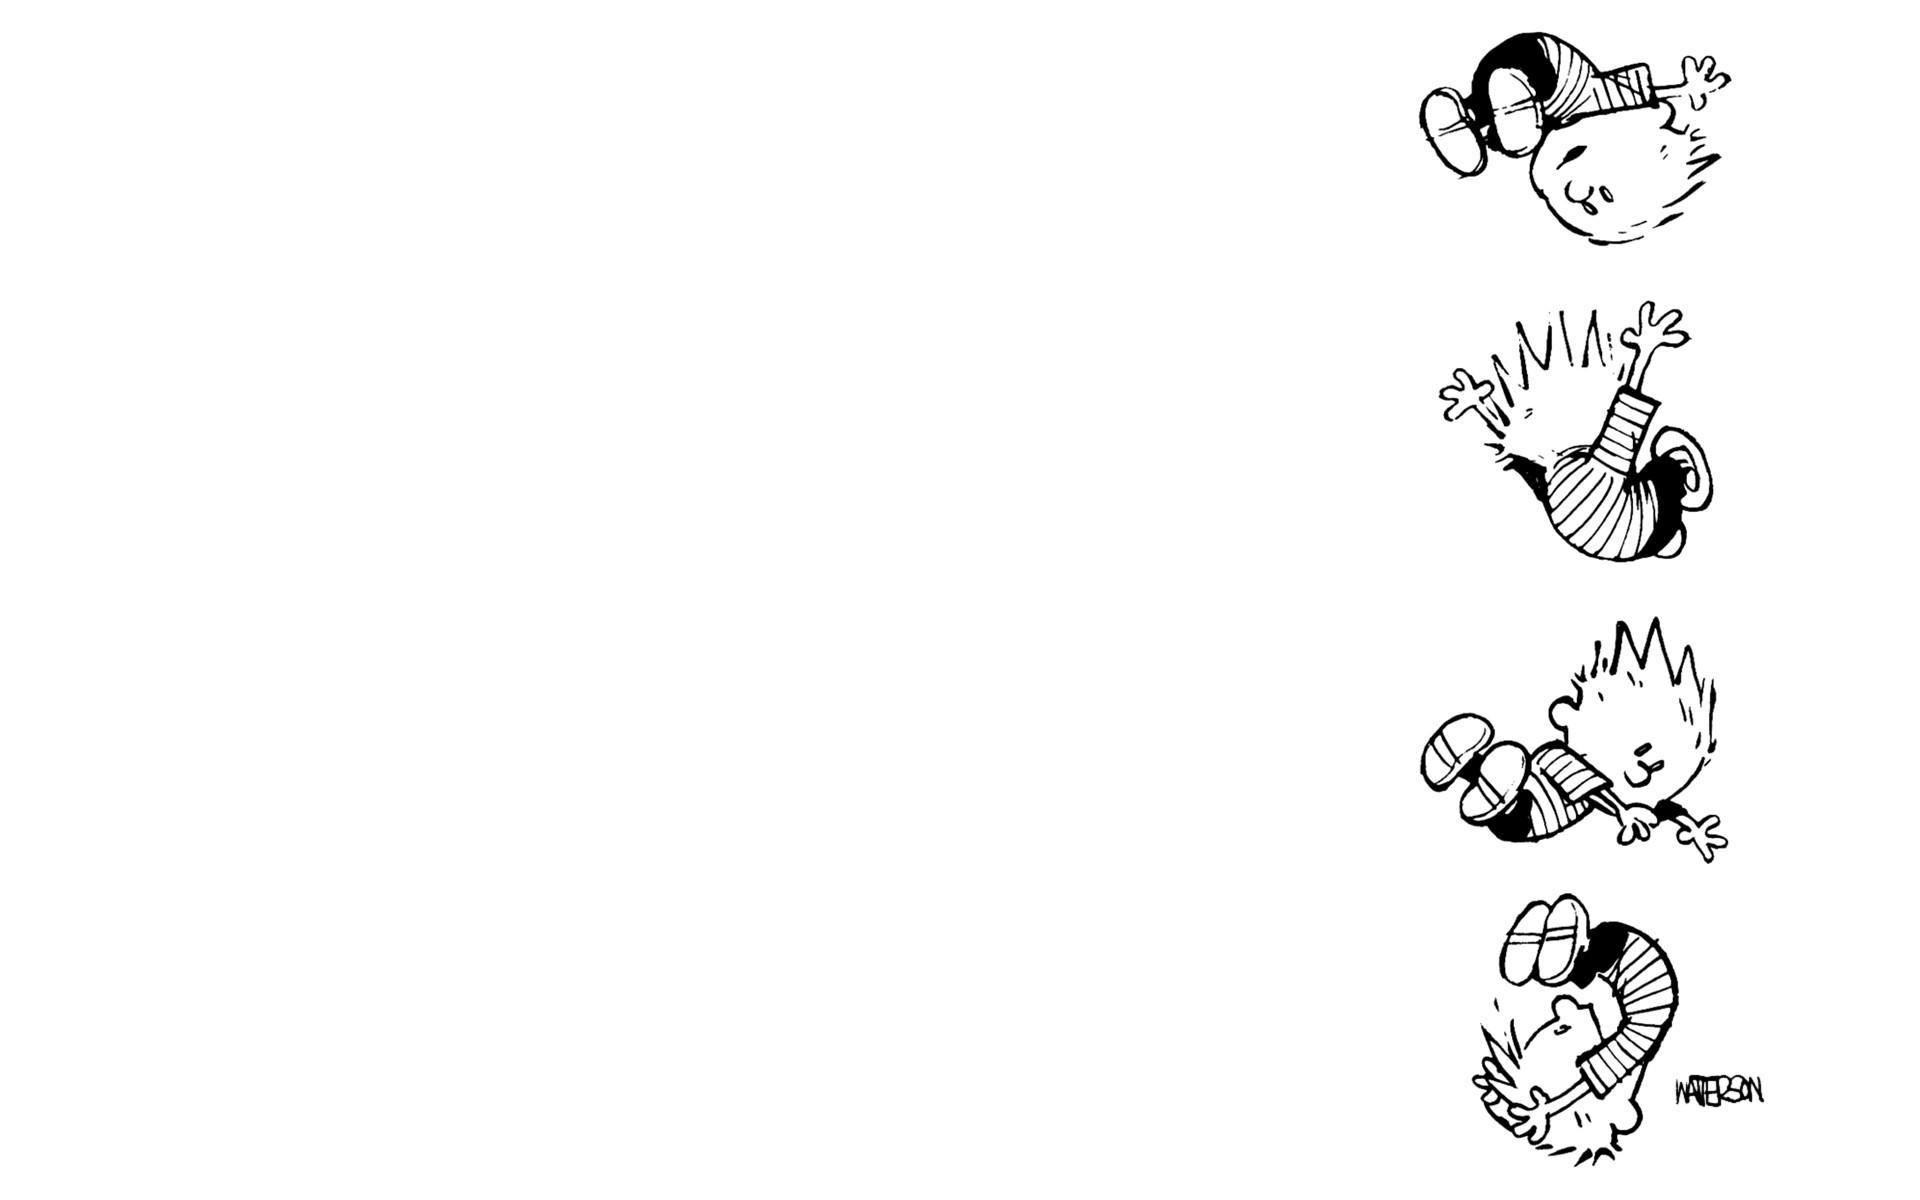 Fall In Love Mobile Wallpaper Calvin And Hobbes Hd Cartoons 4k Wallpapers Images